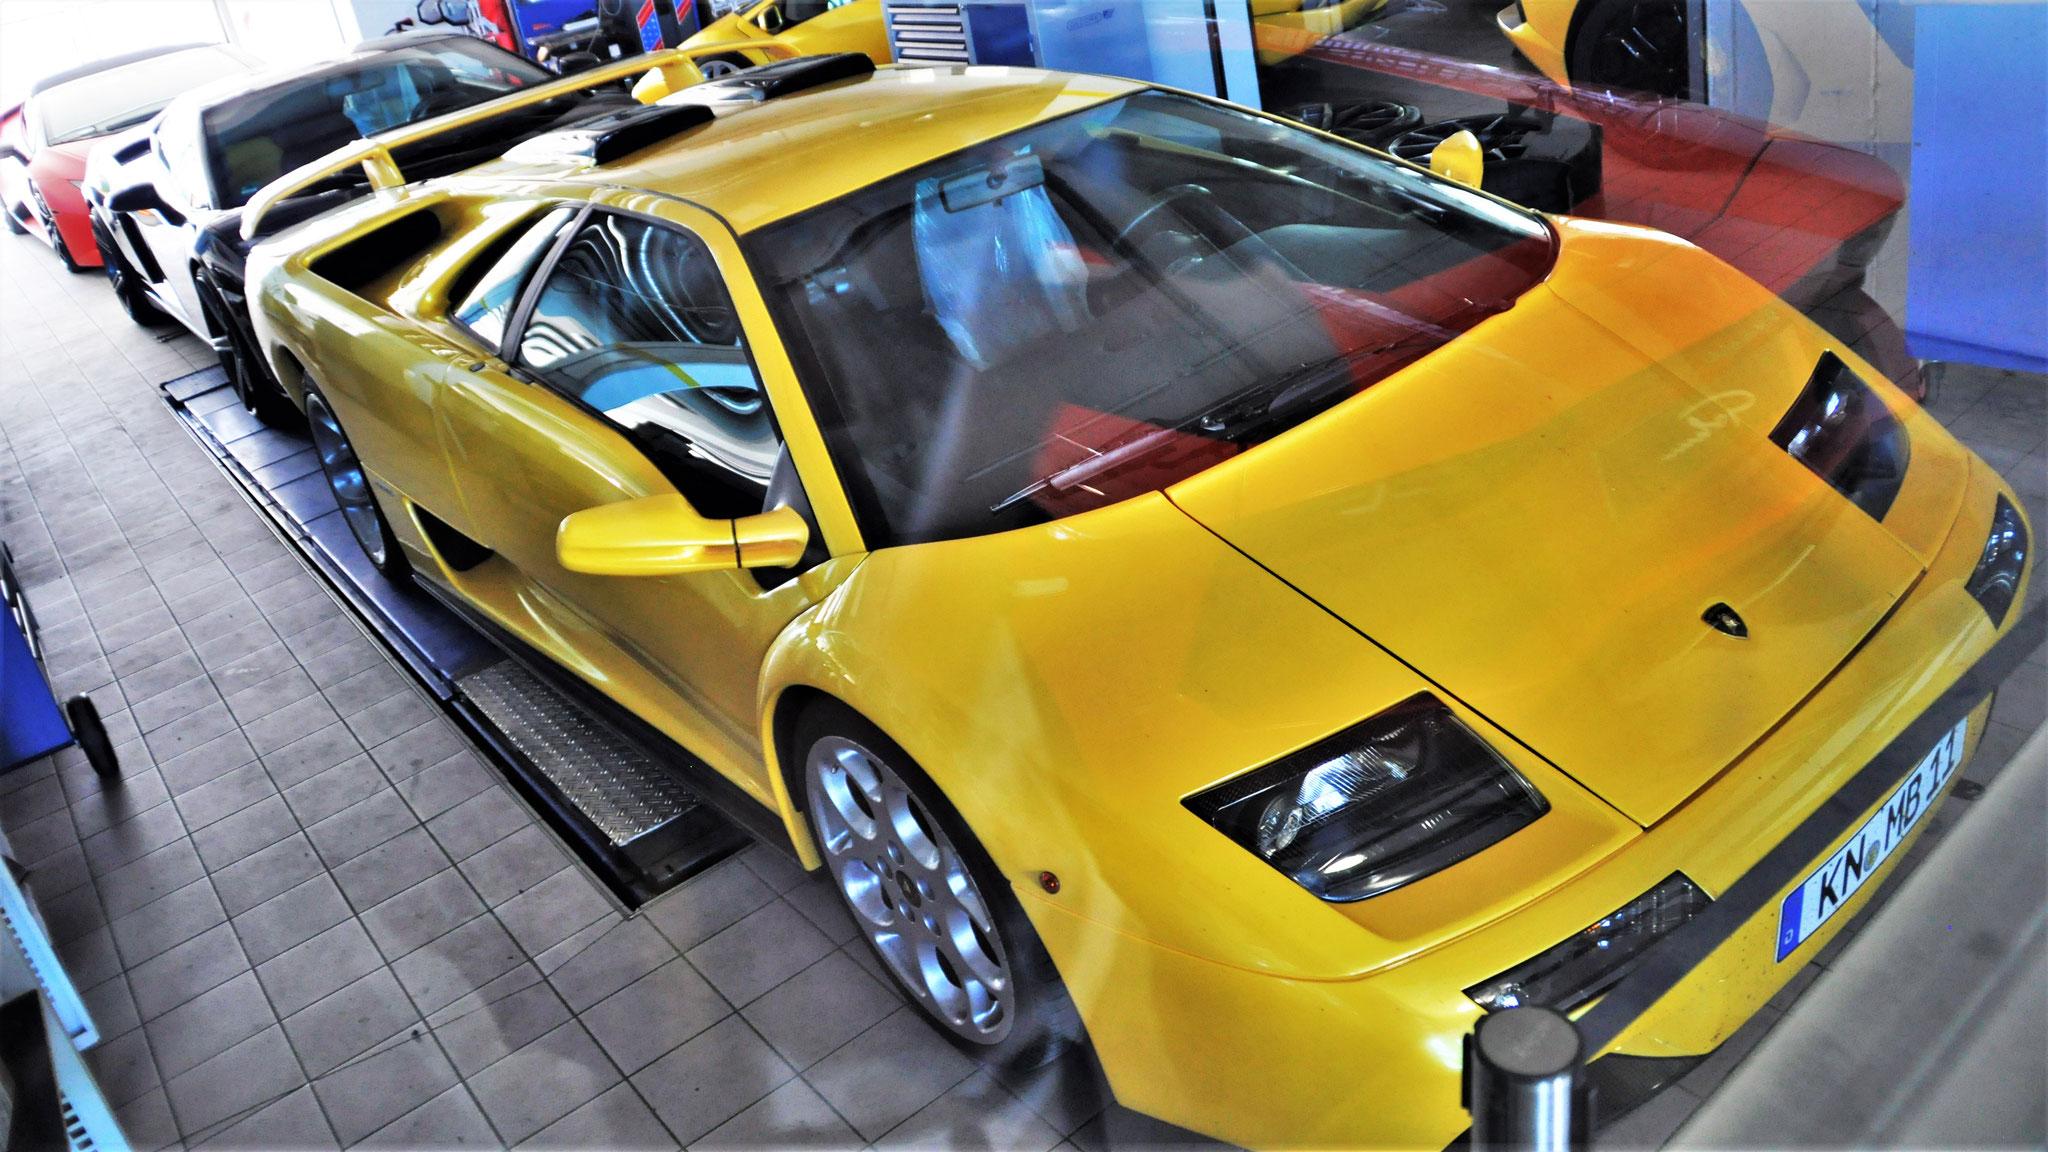 Lamborghini Diablo GT - KN-MB-11